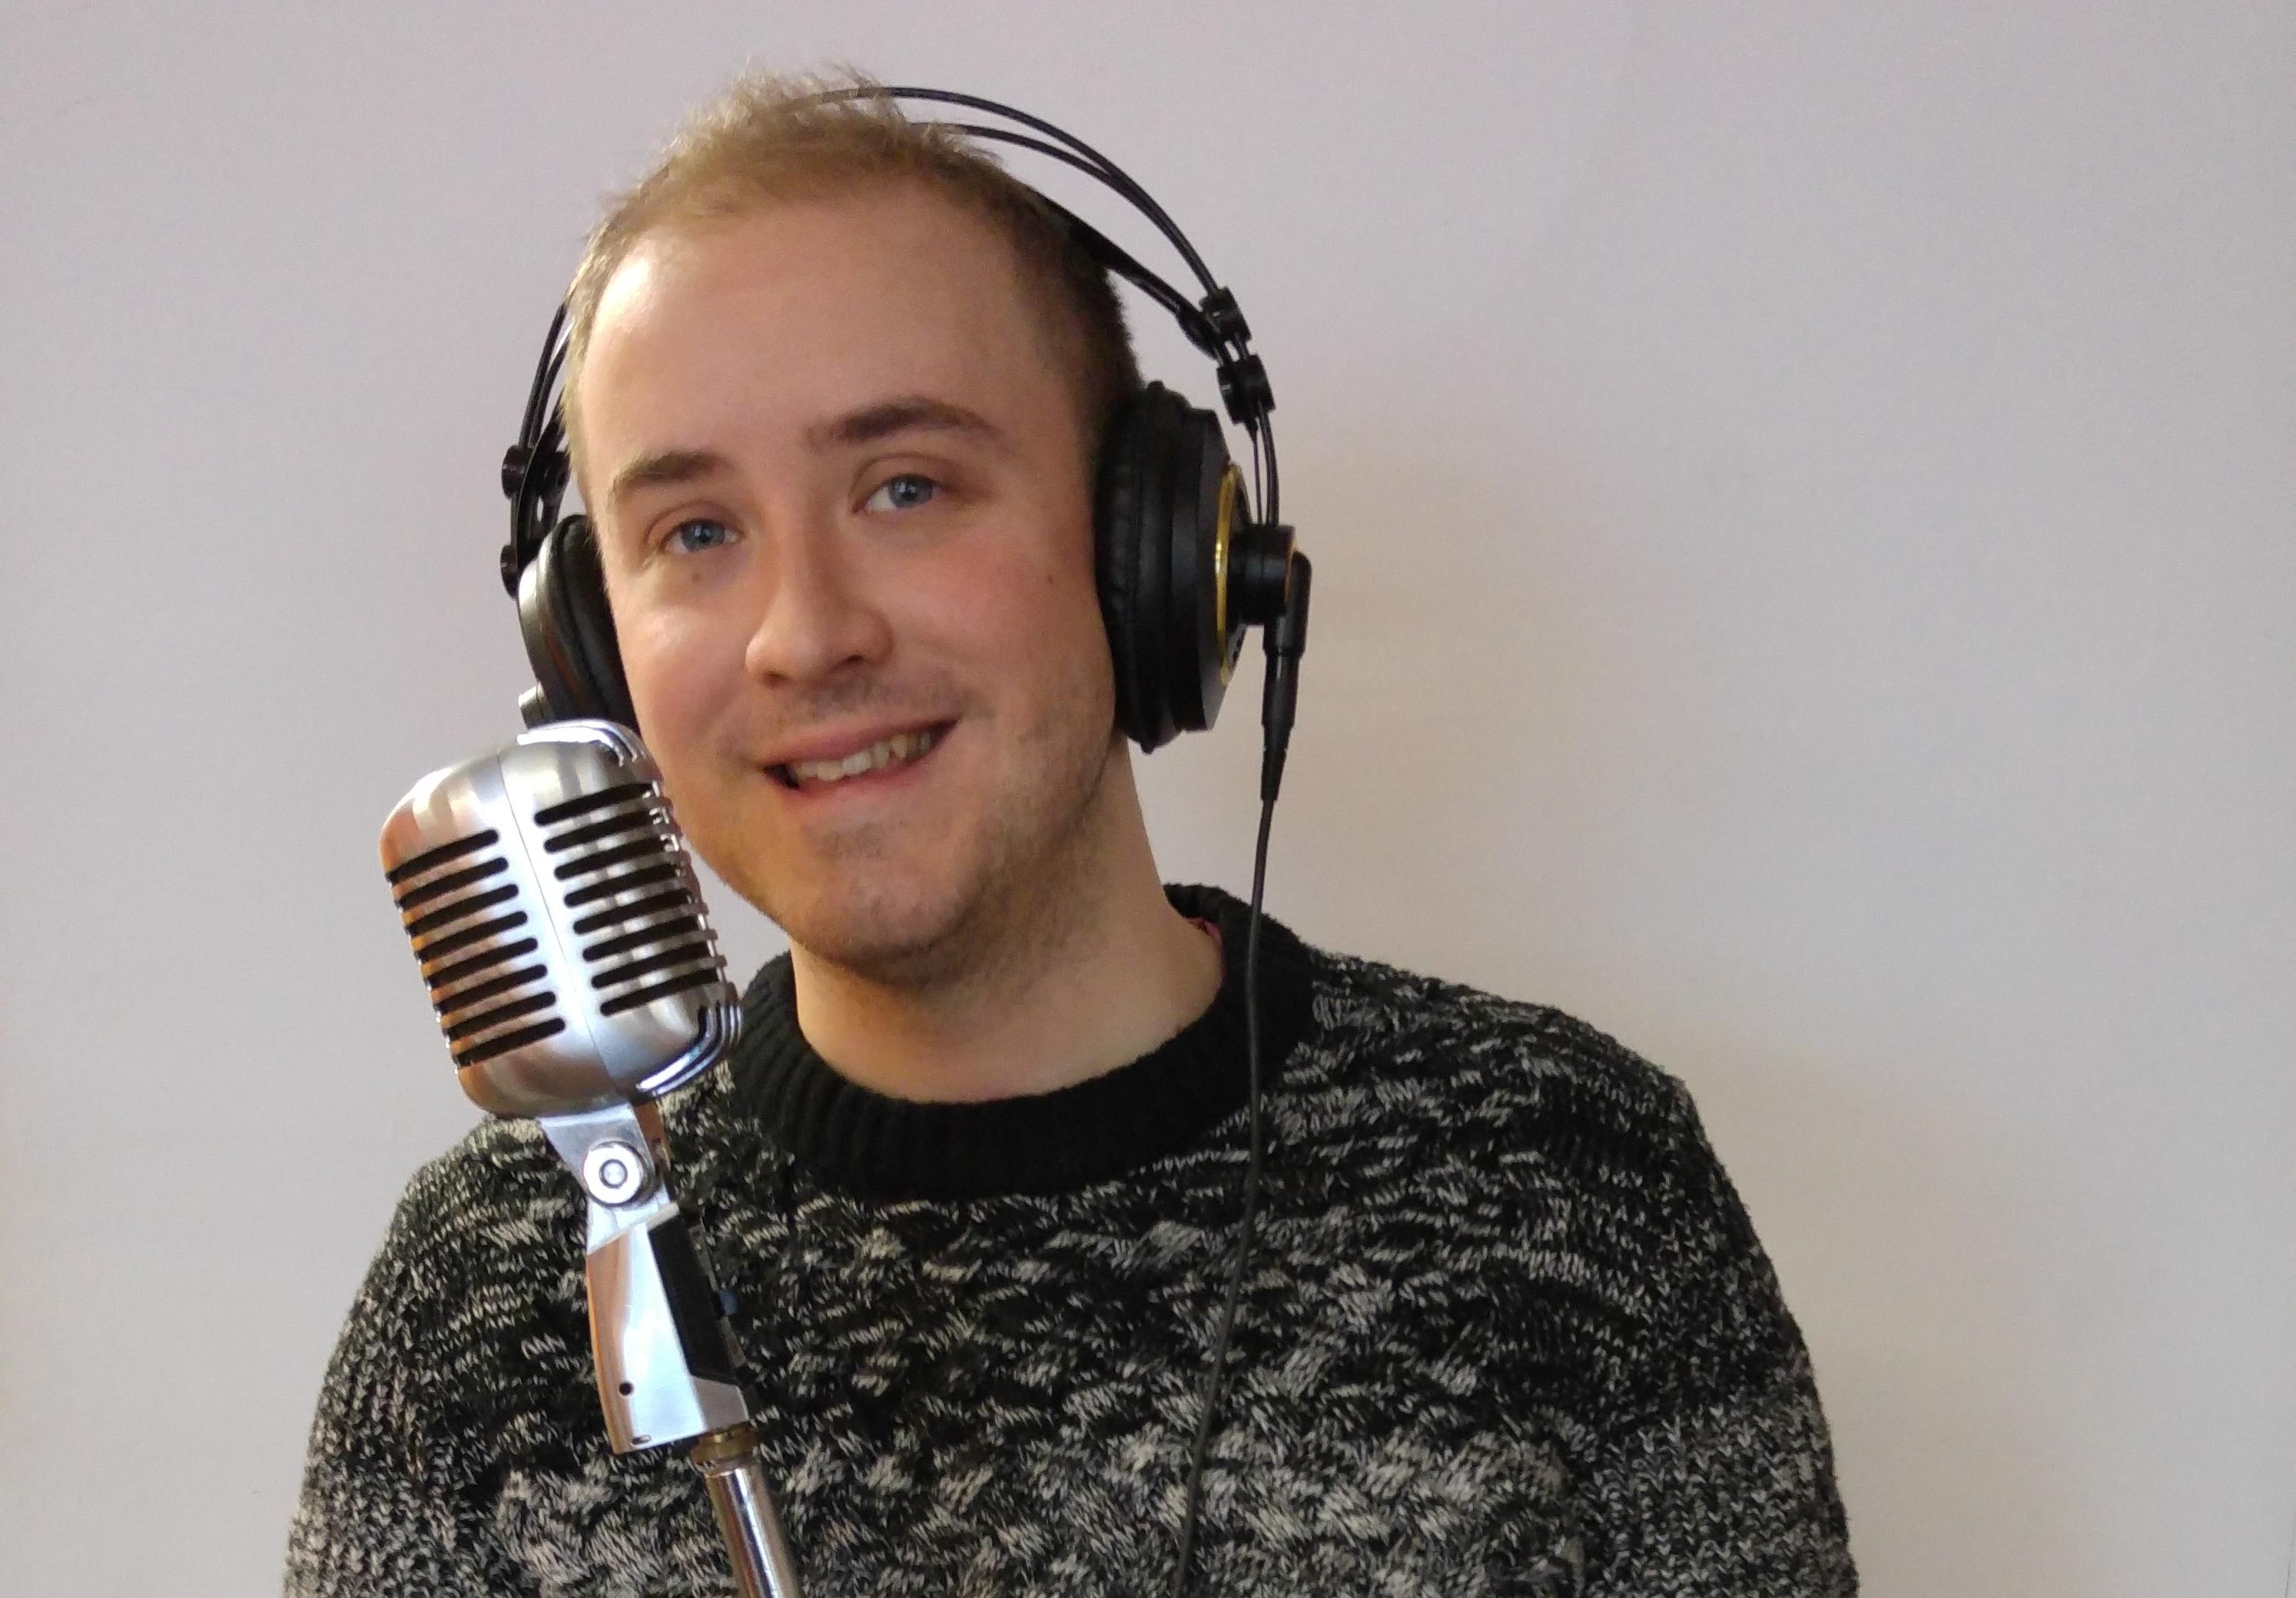 Gregor Palovšnik1